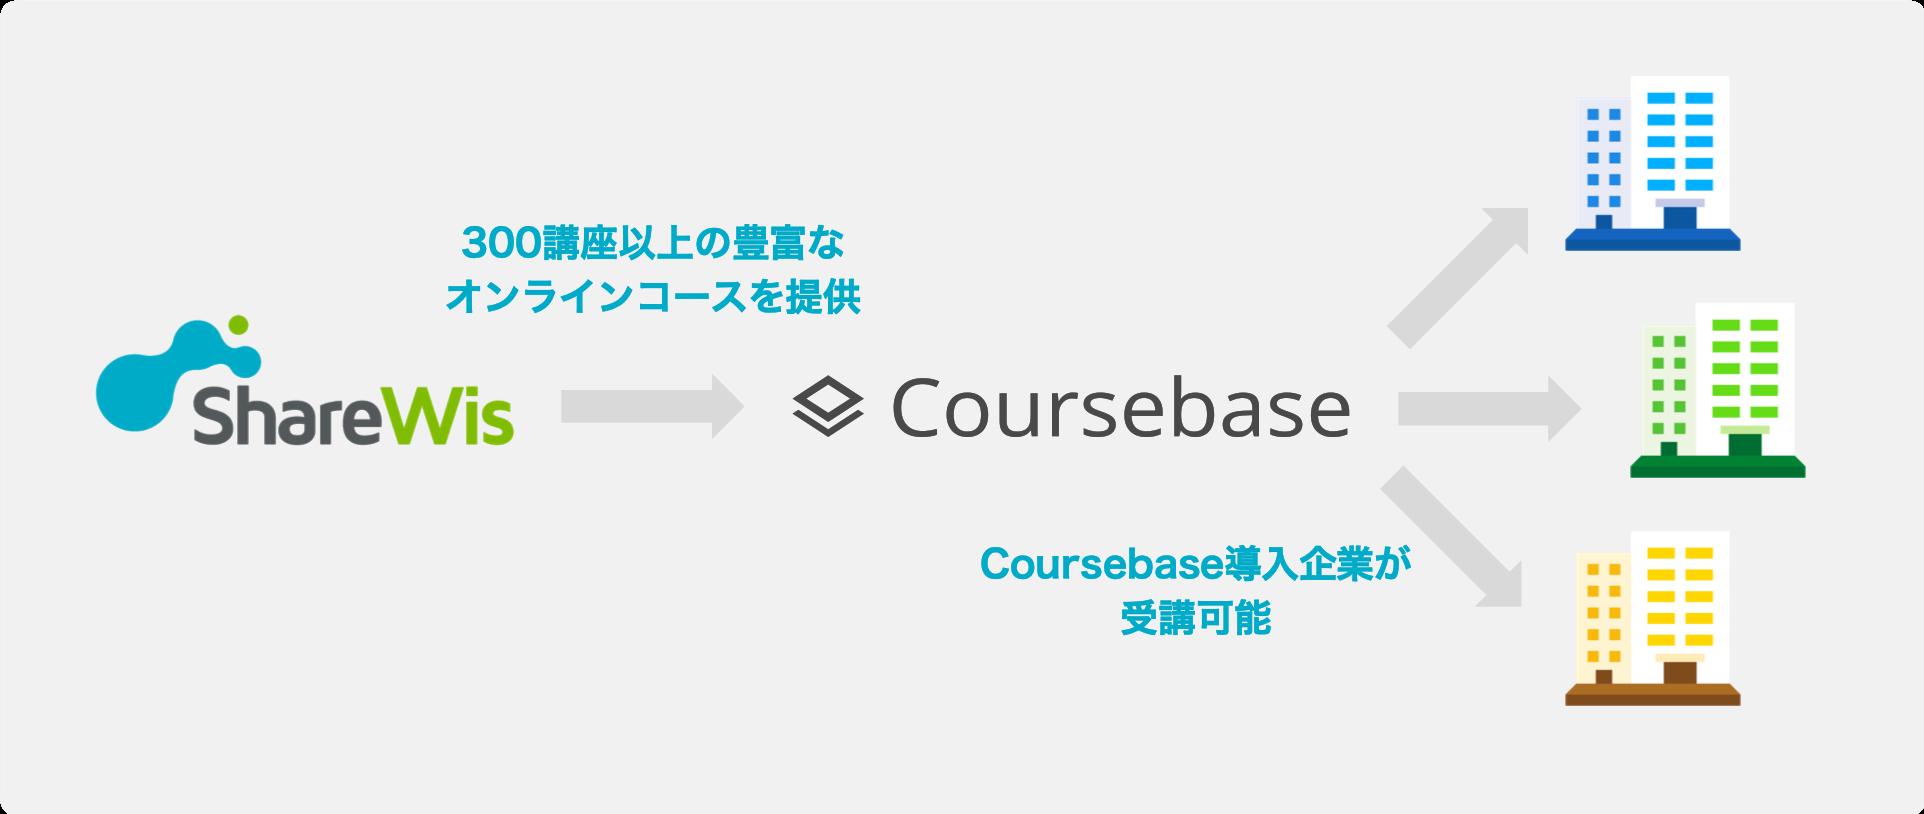 ShareWisとCoursebaseの提携内容の模式図